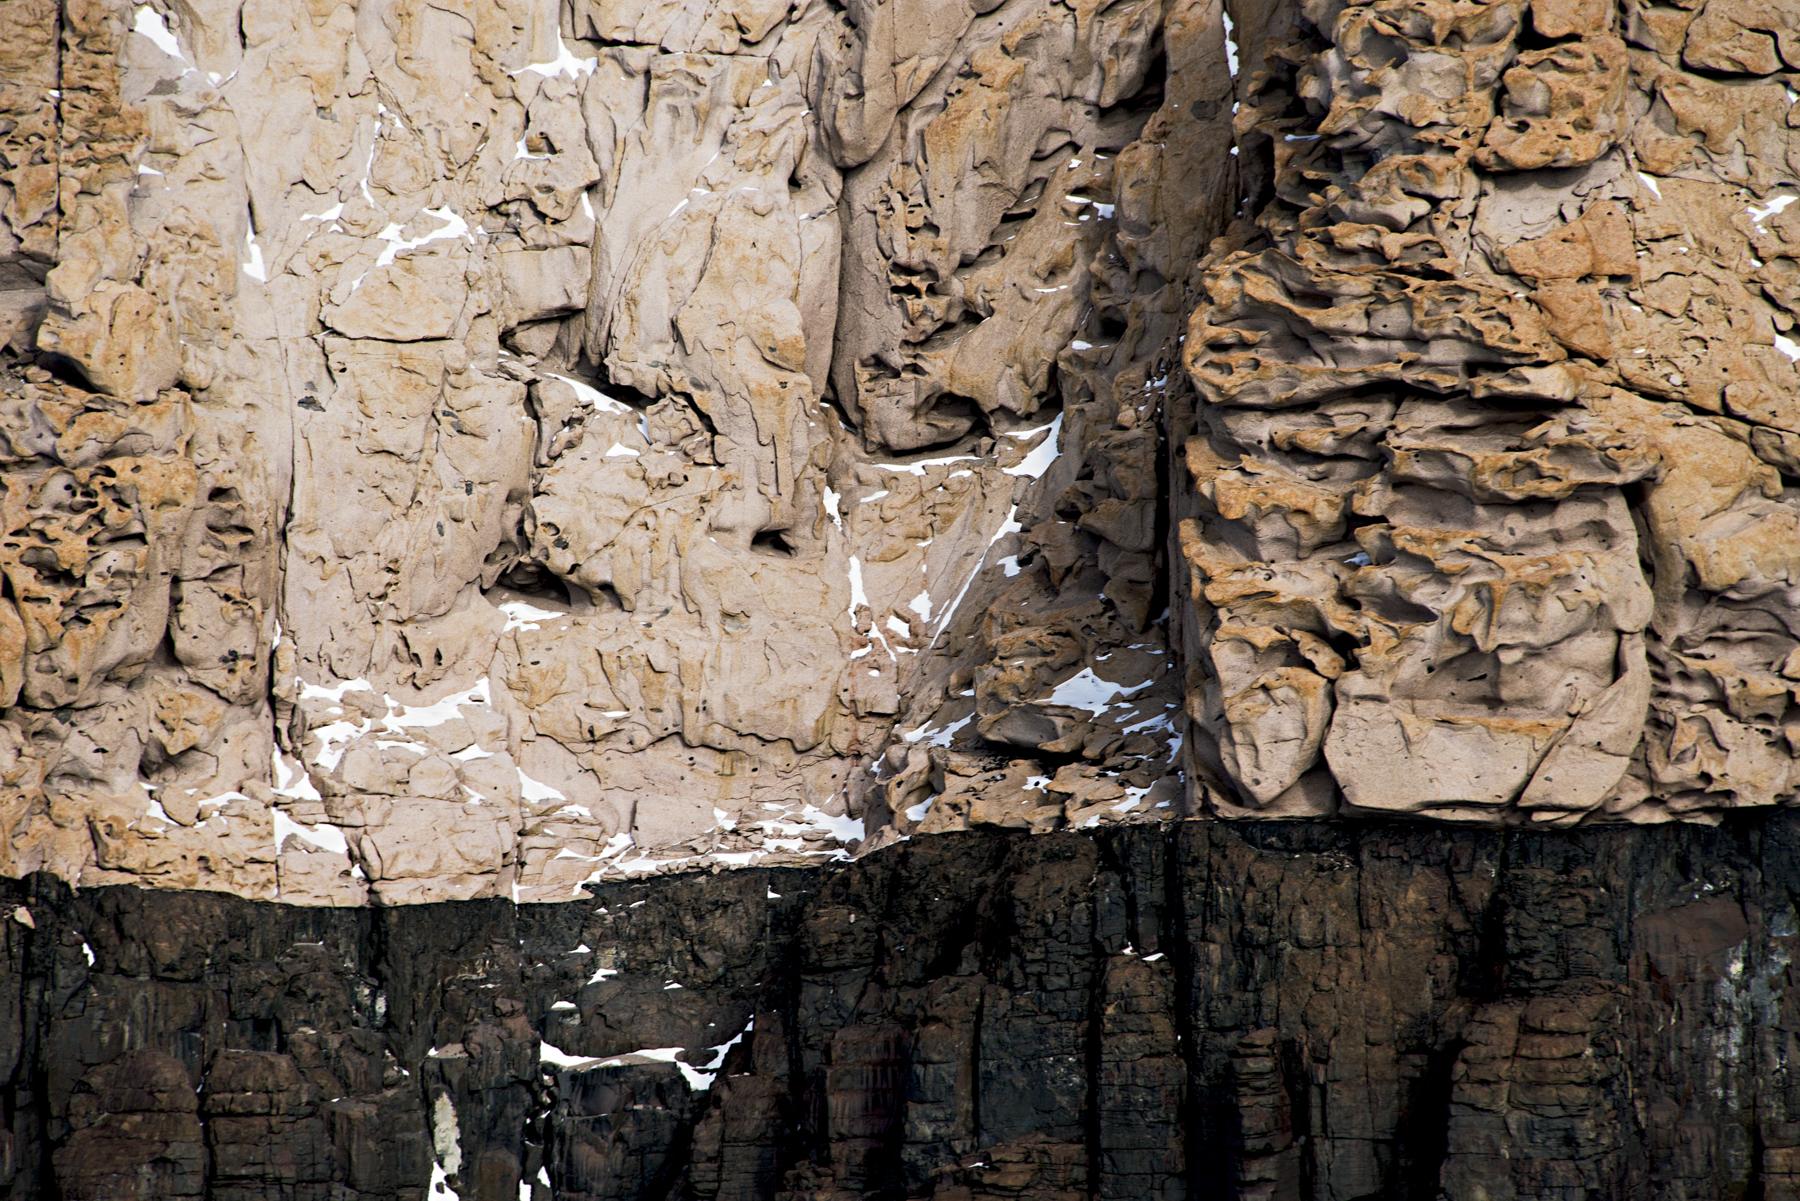 Dolerite and Sandstone, Saint Johns Range